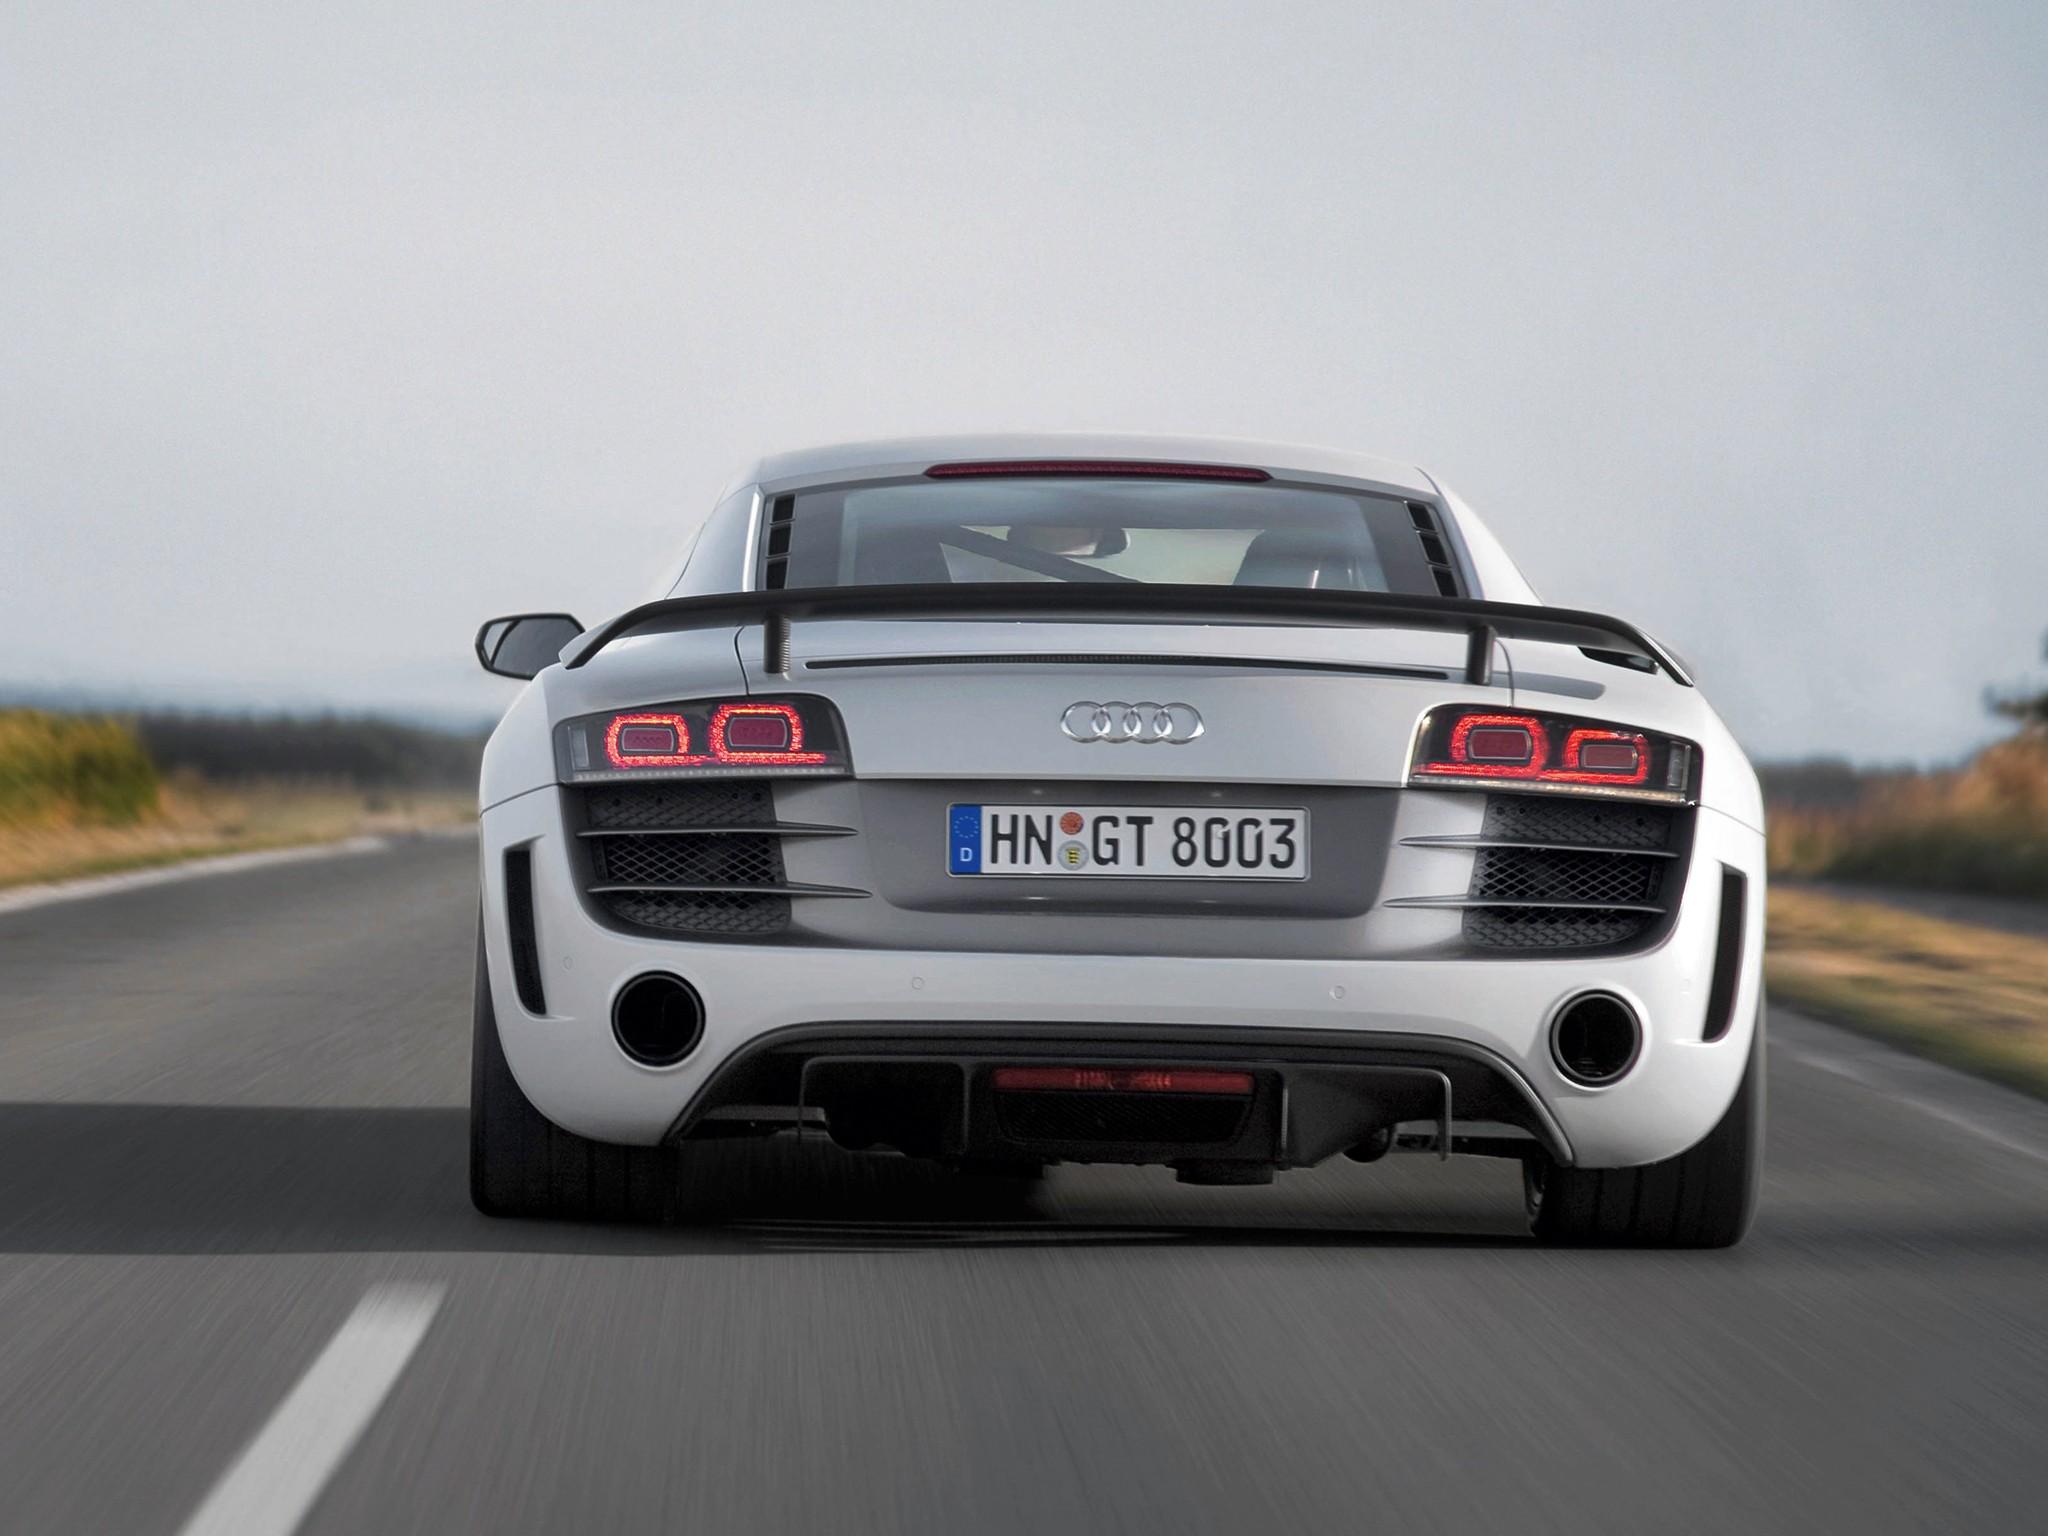 AUDI R8 GT - 2010, 2011, 2012, 2013 - autoevolution